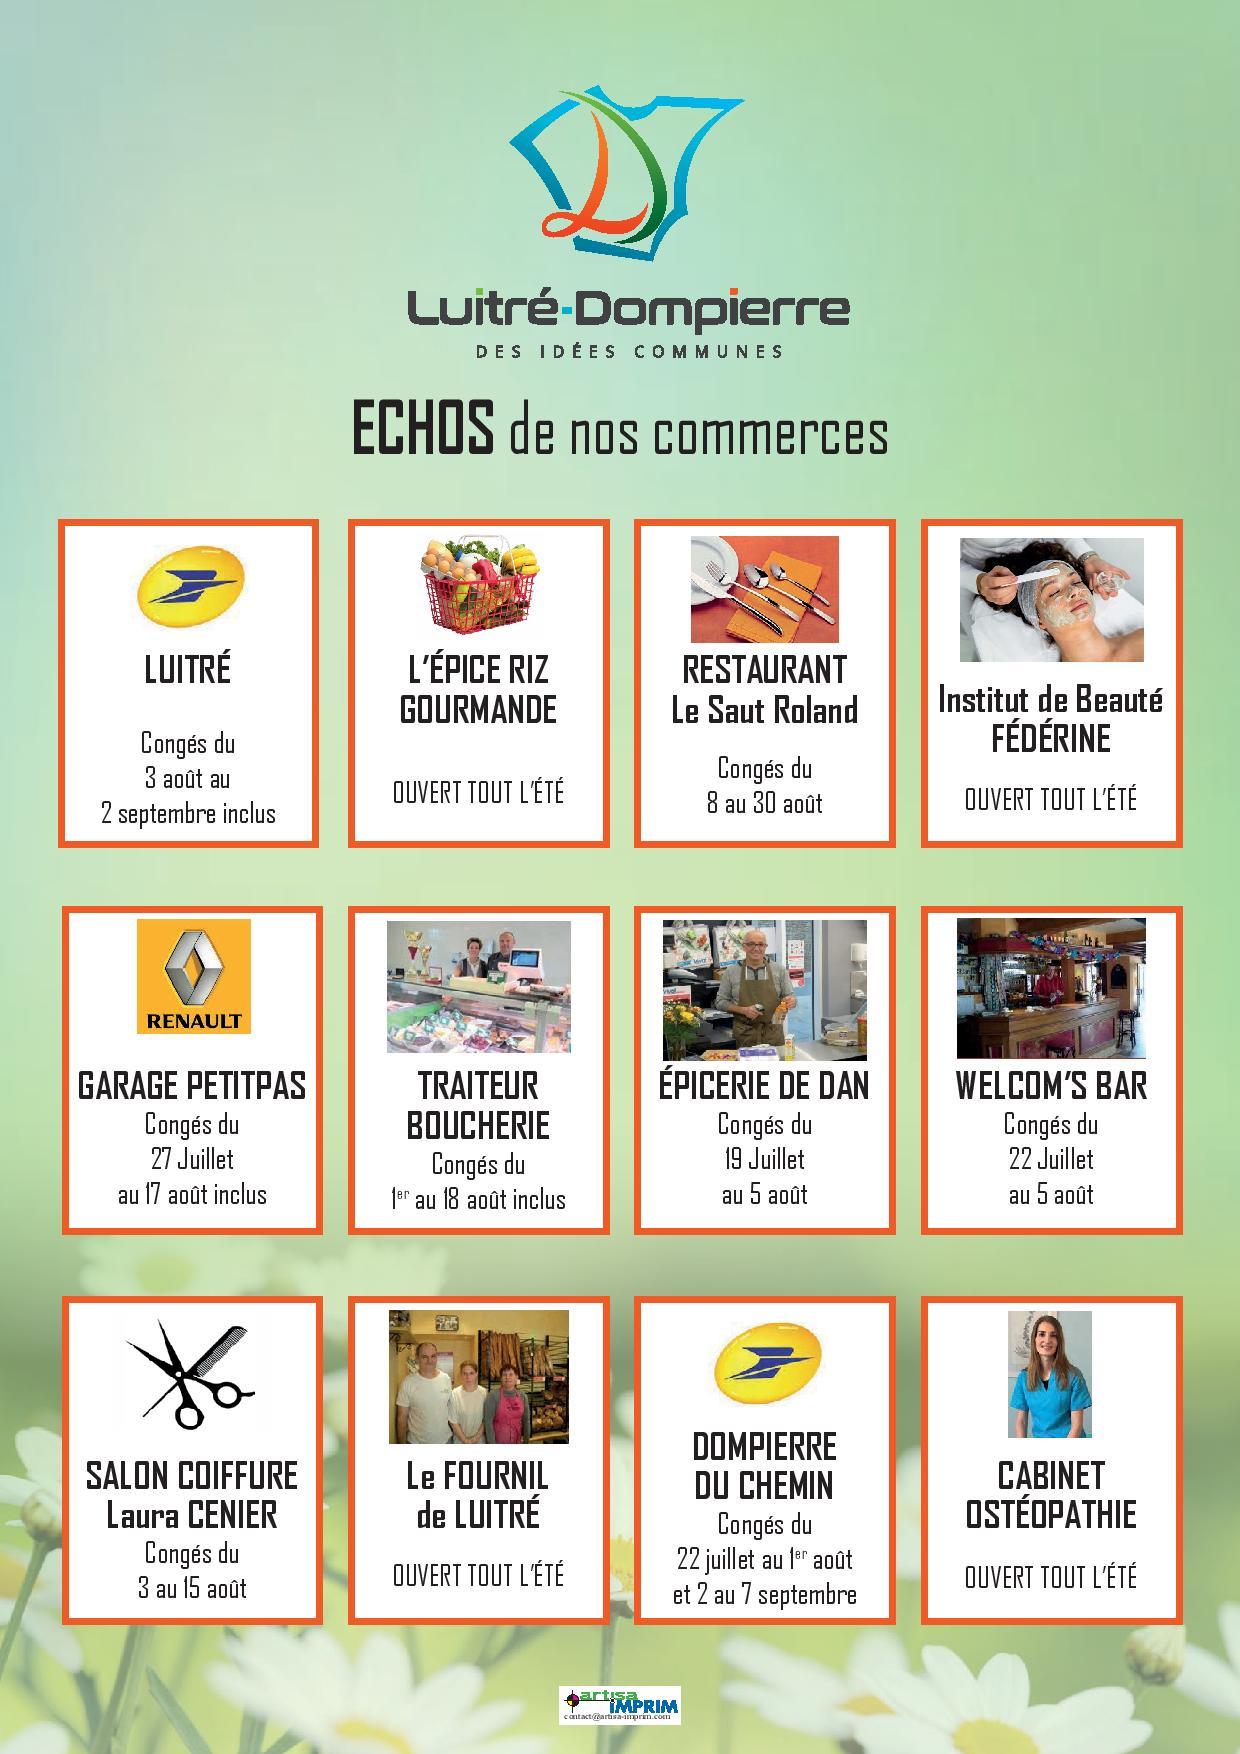 LUITRE-DOMPIERRE Bulletin Municipal n-¦ -page-020.jpg